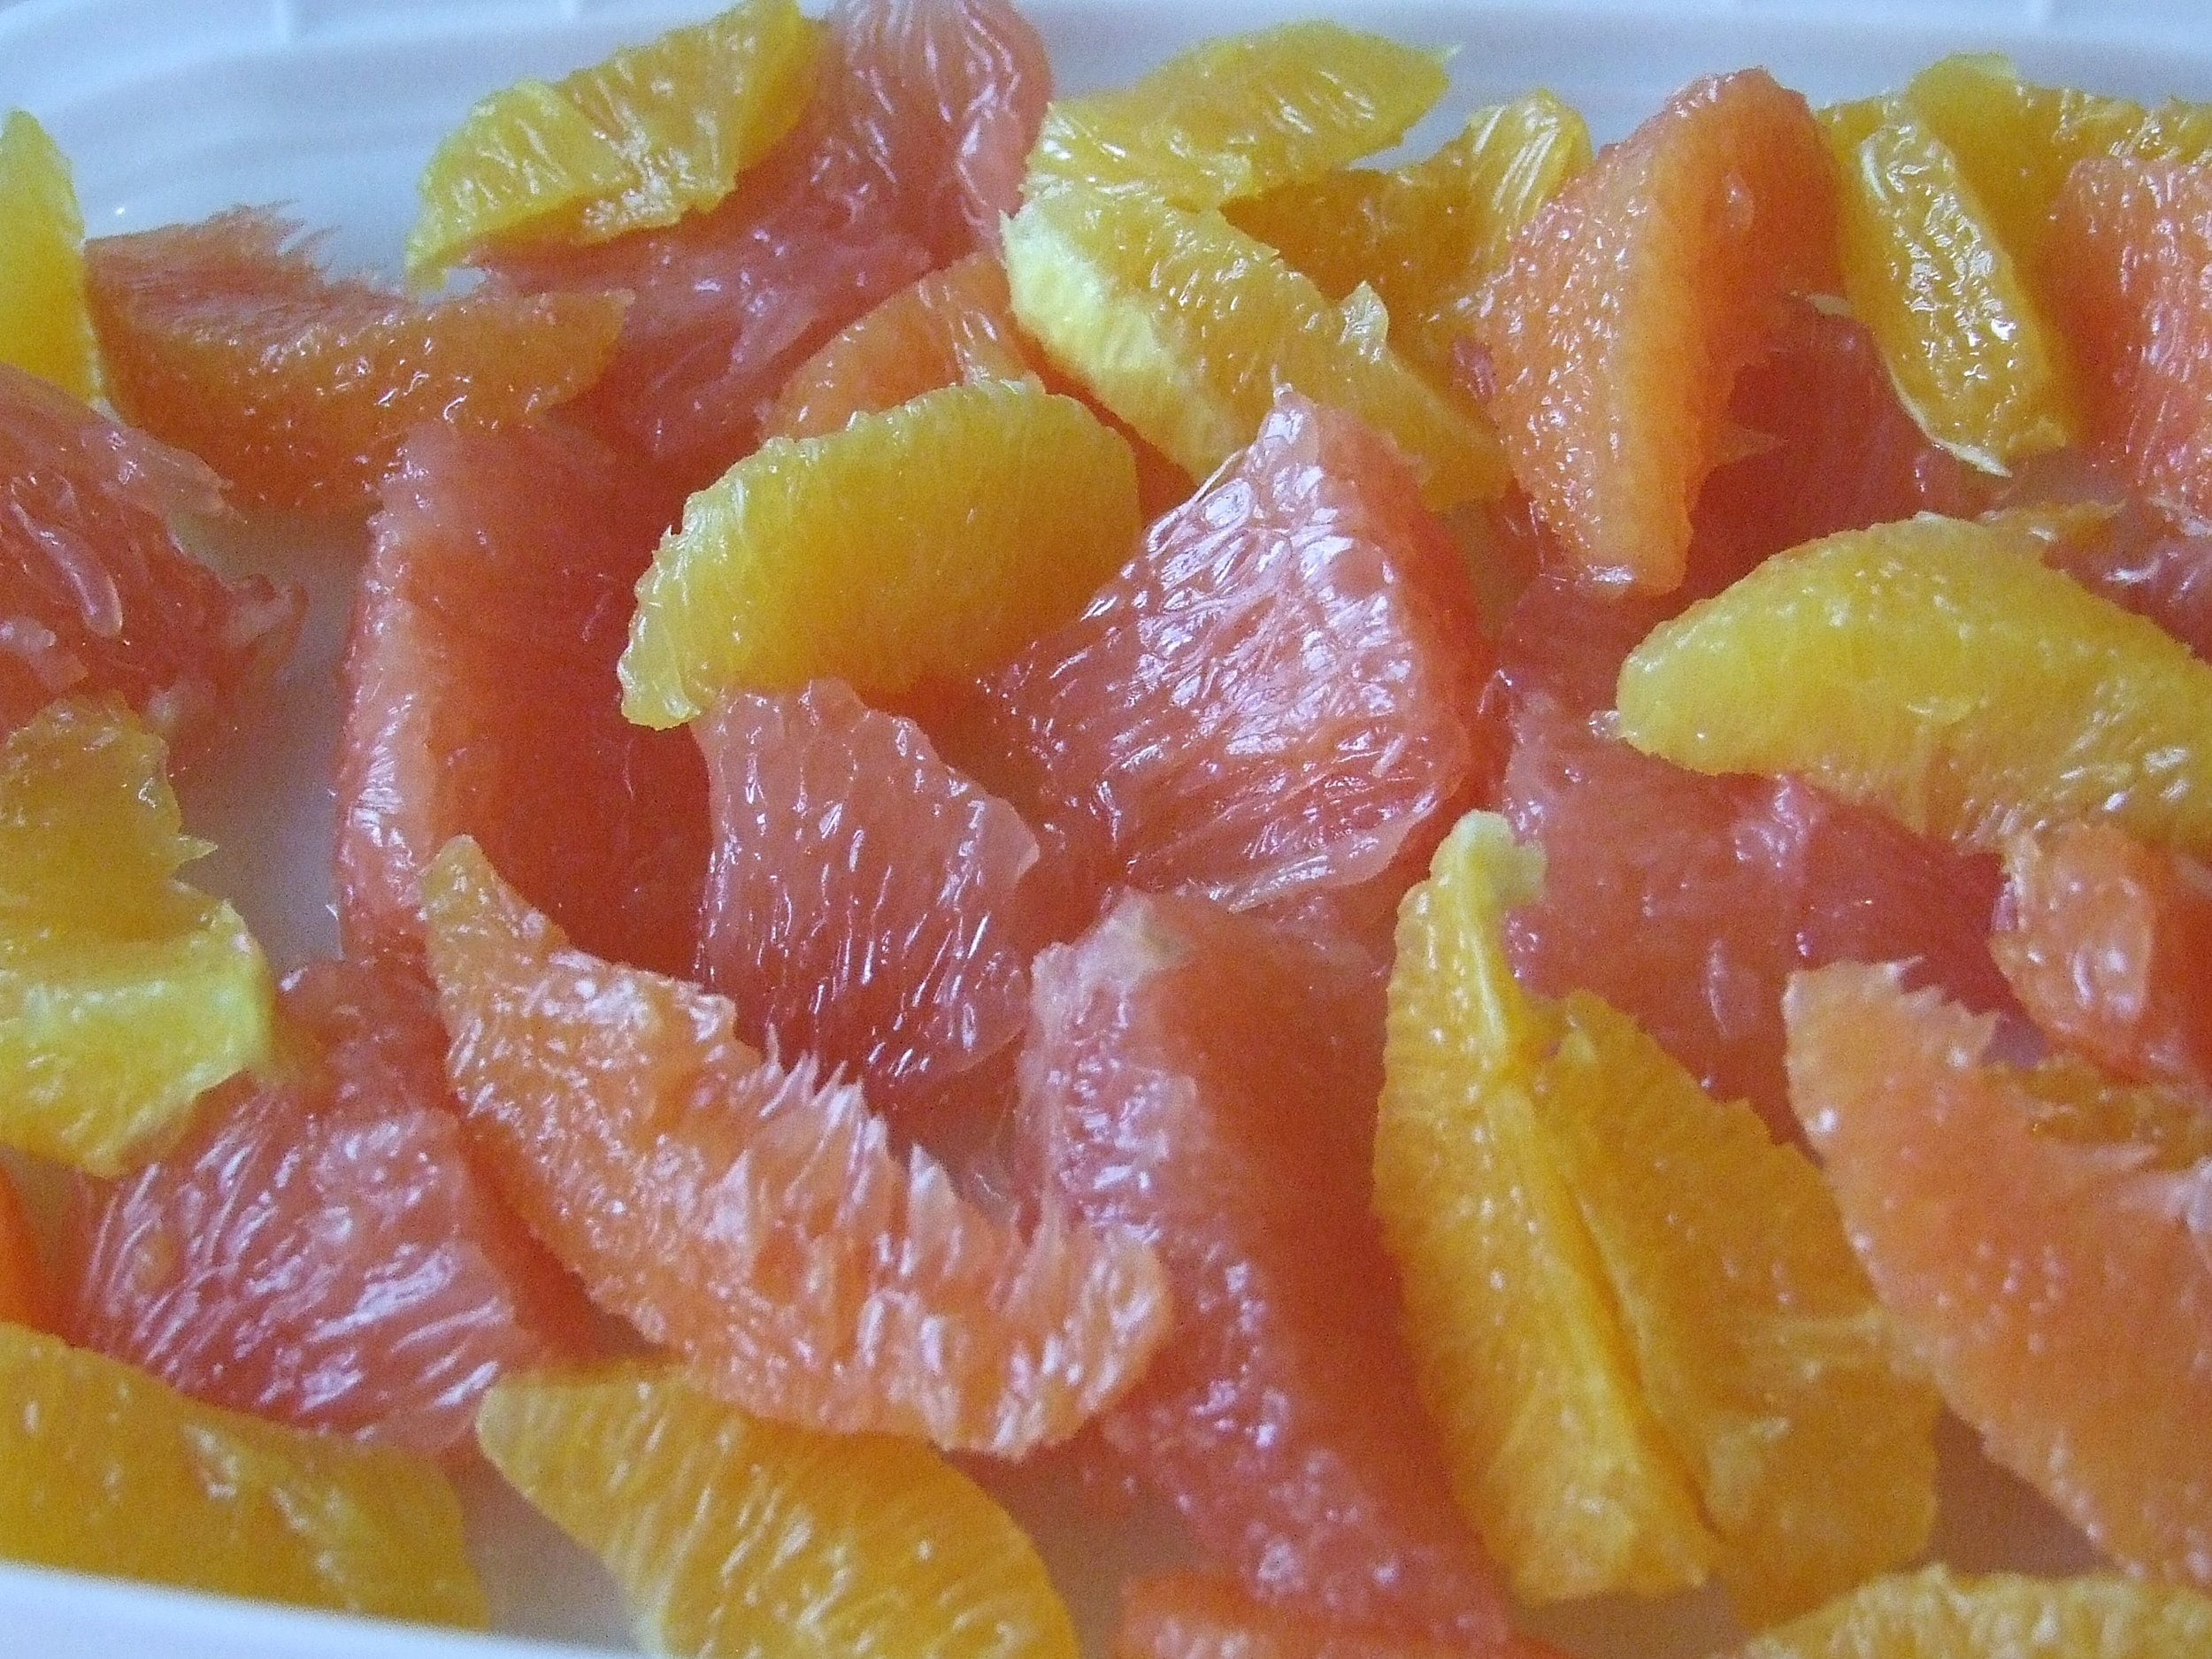 citrus_segments.jpg